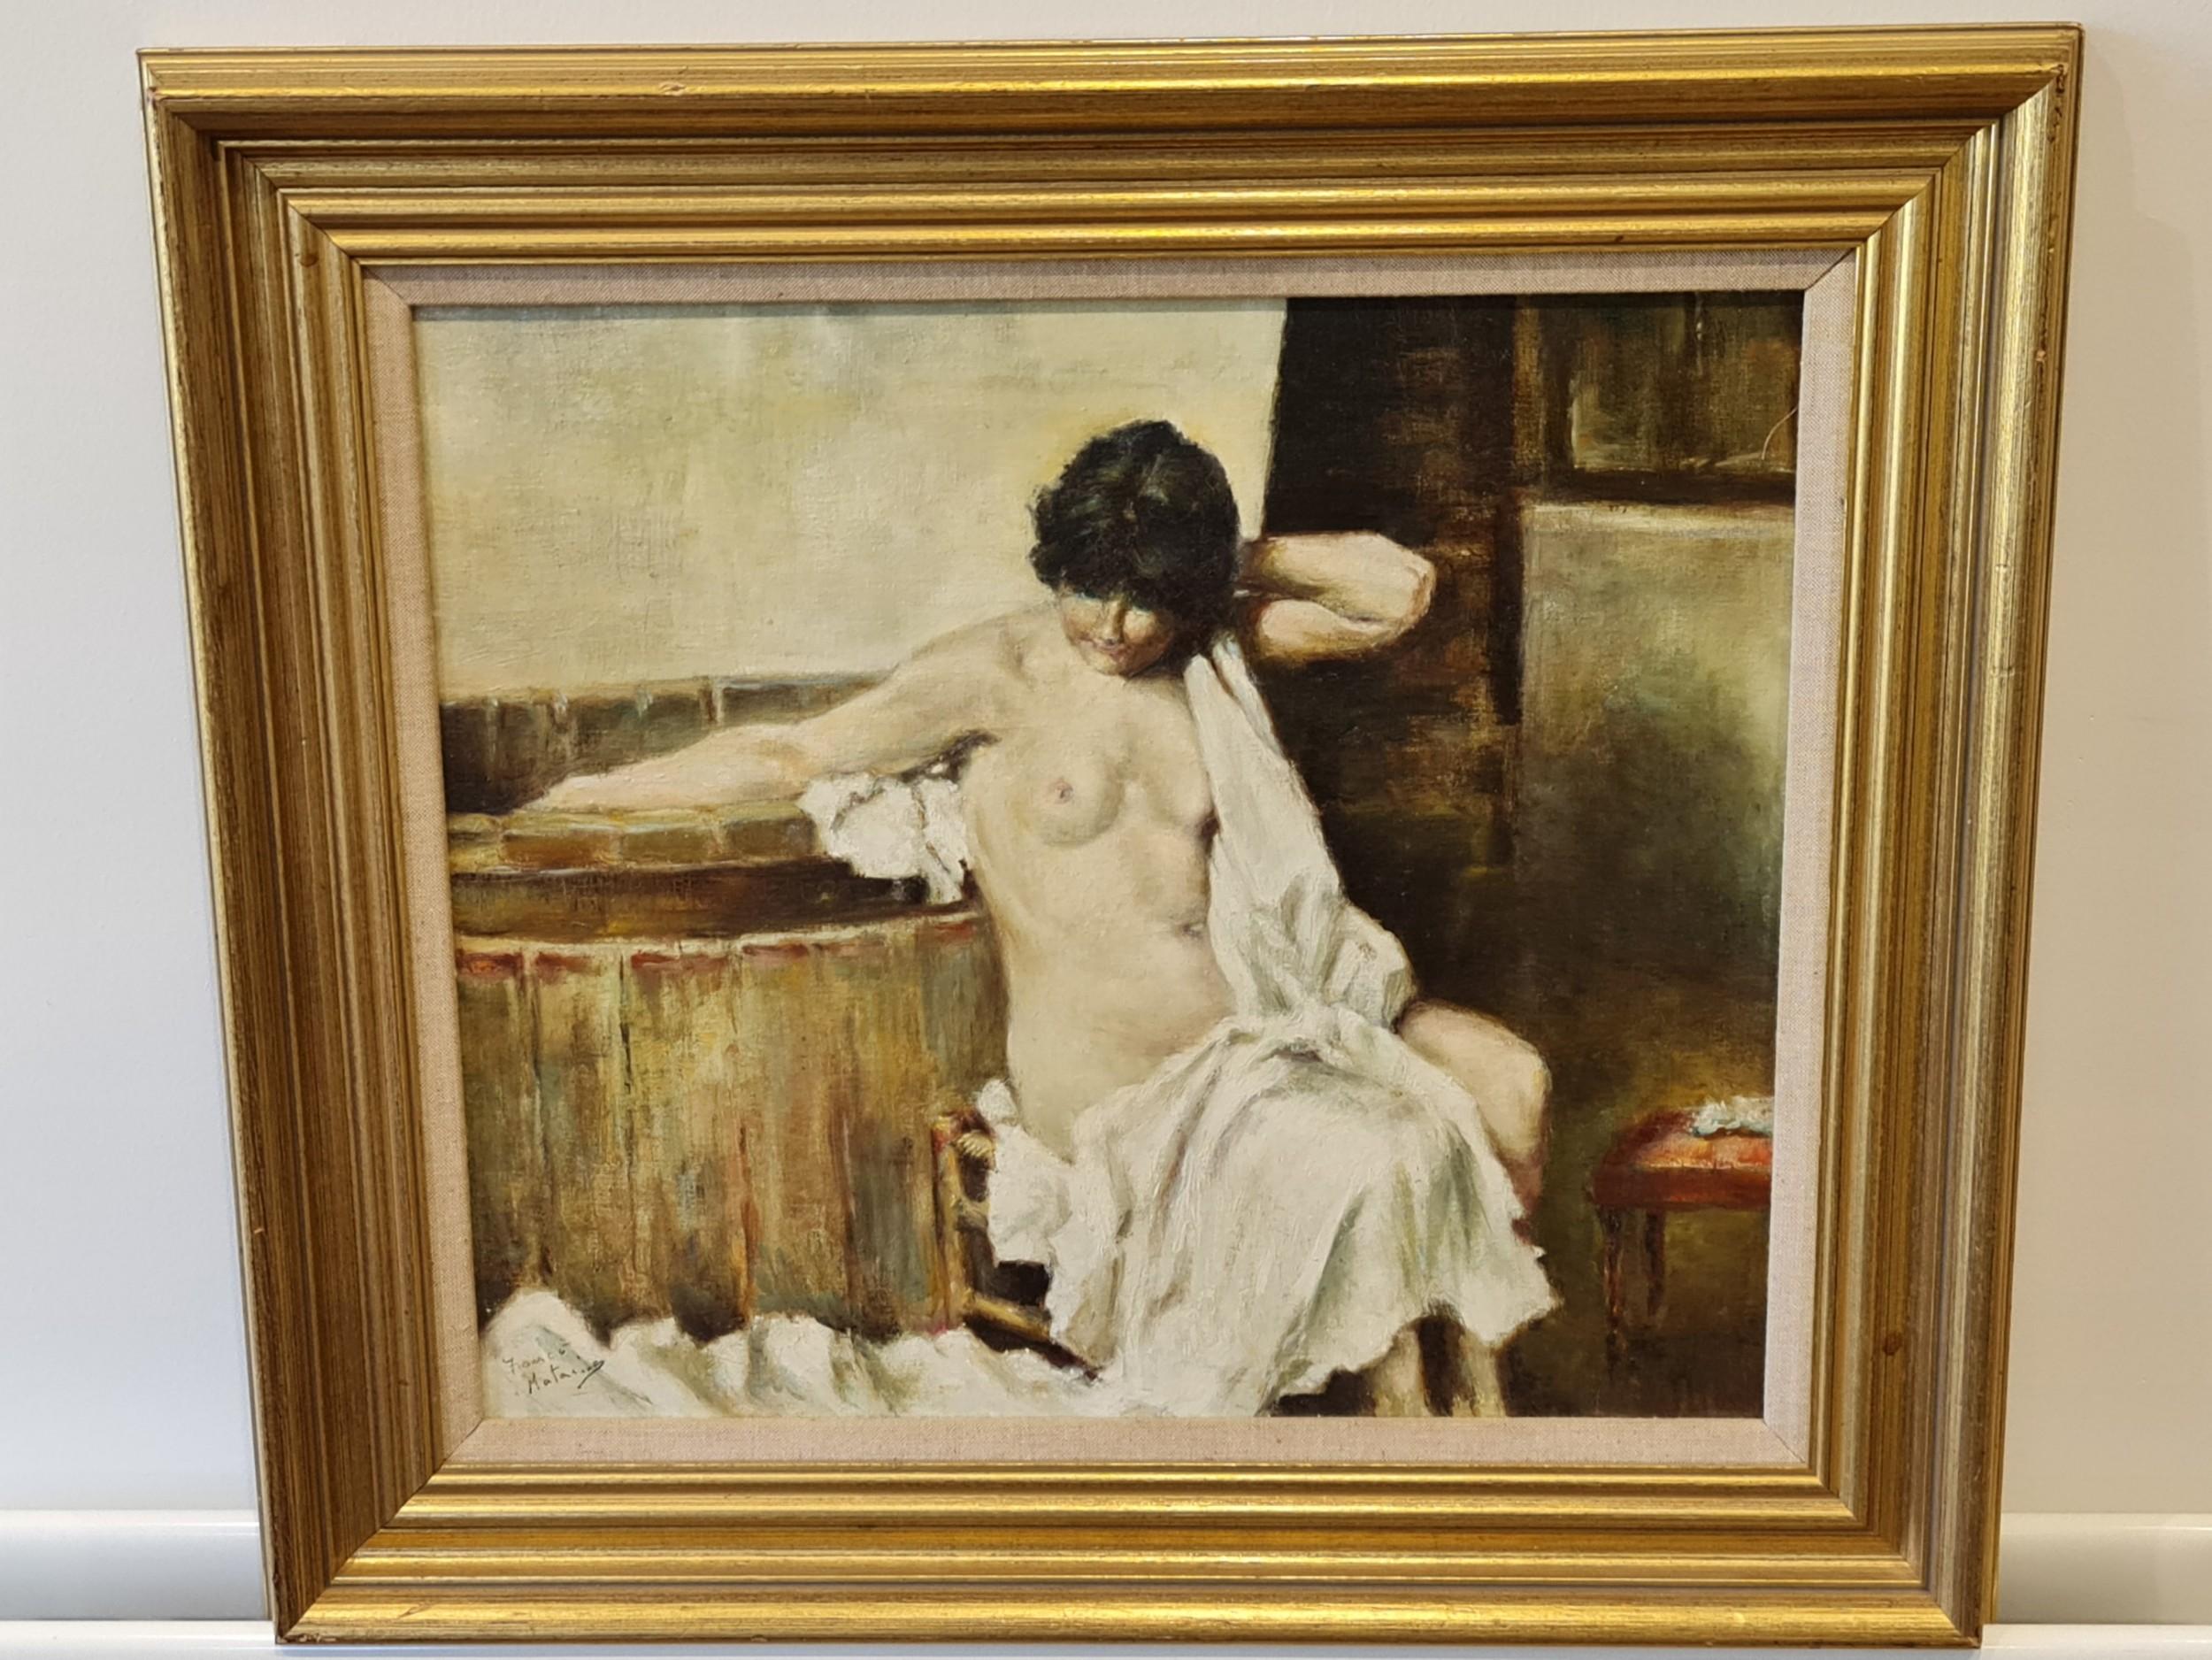 franco matania nude 19222006 italianbritish oil on canvas